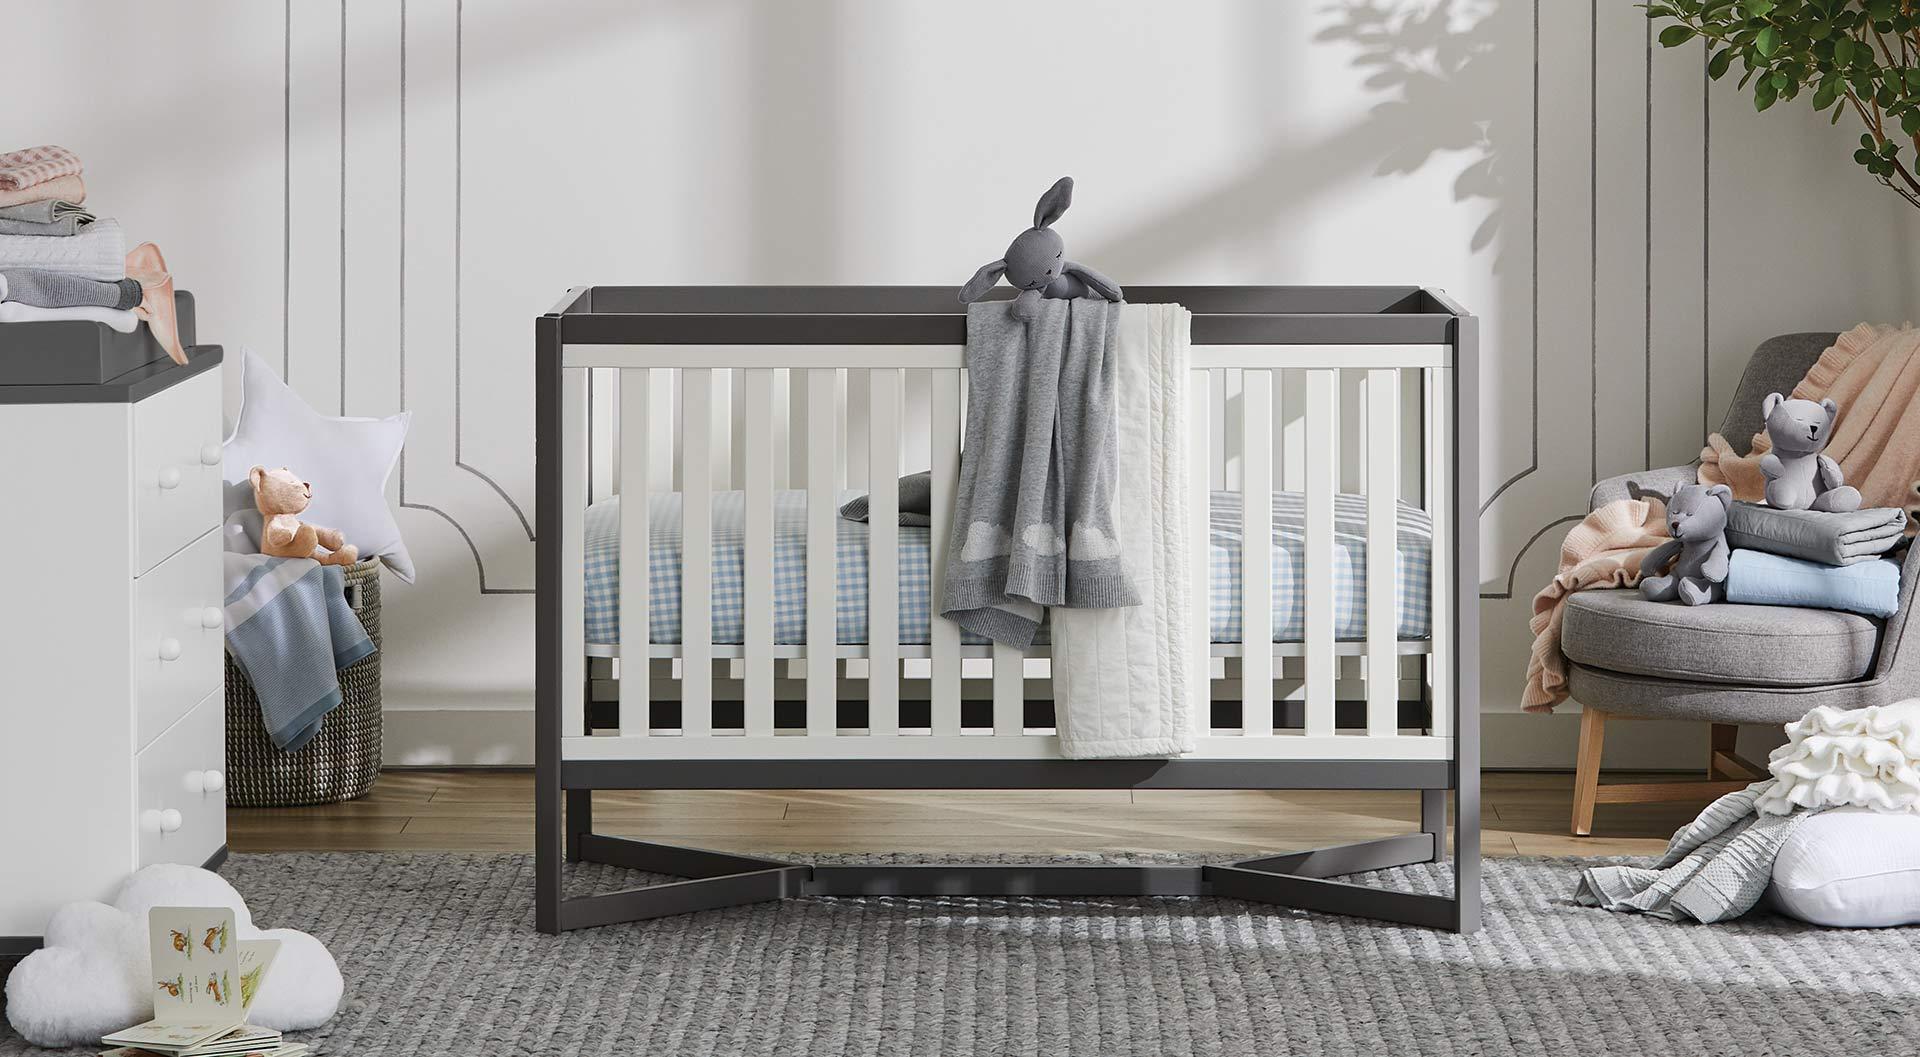 Littles by GlucksteinHome   baby furniture, bedding, and accessories